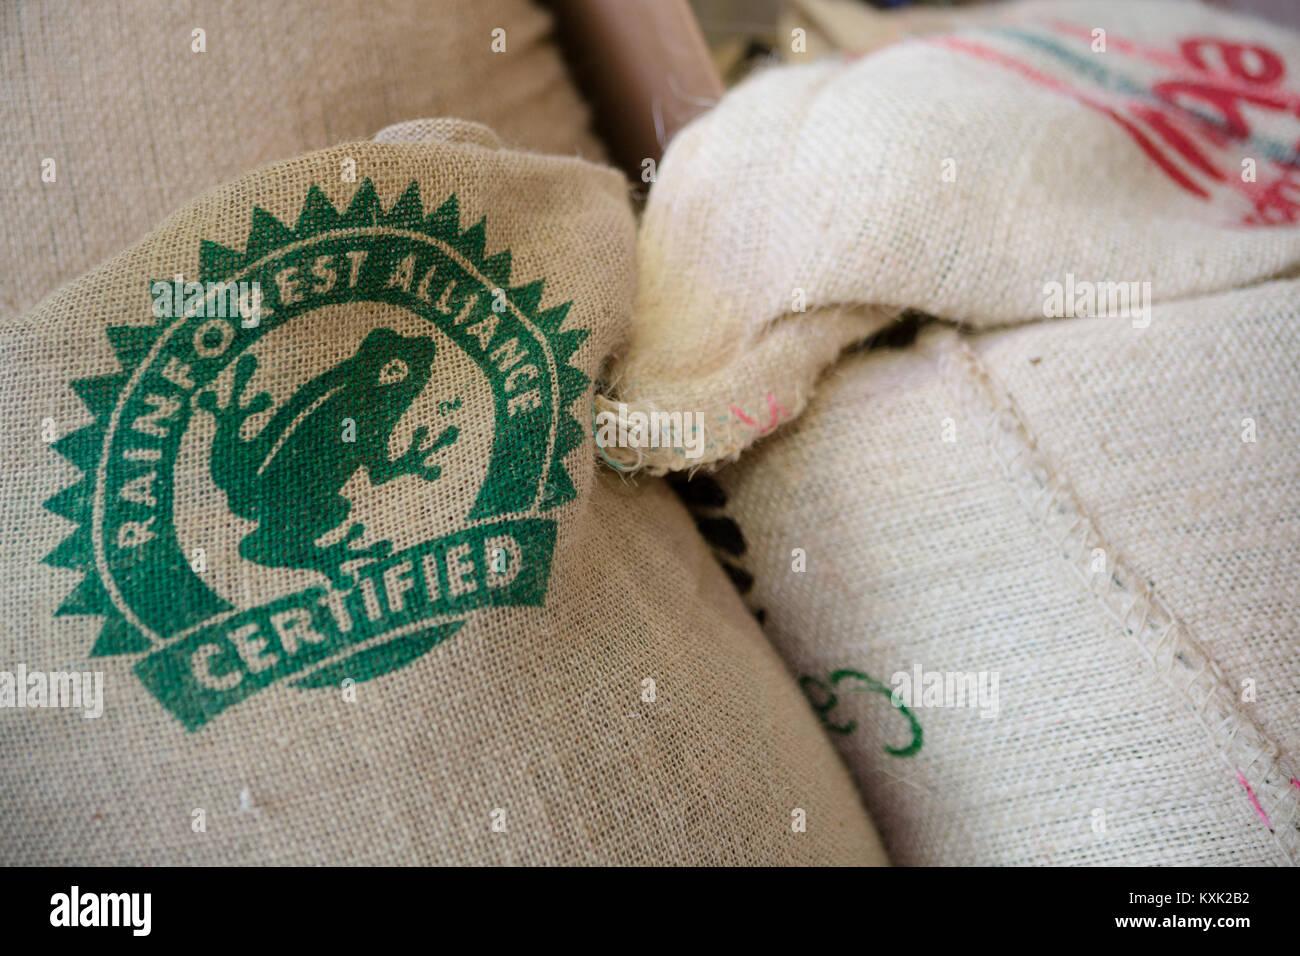 606efc3af Los sacos de café verde Foto & Imagen De Stock: 171293334 - Alamy